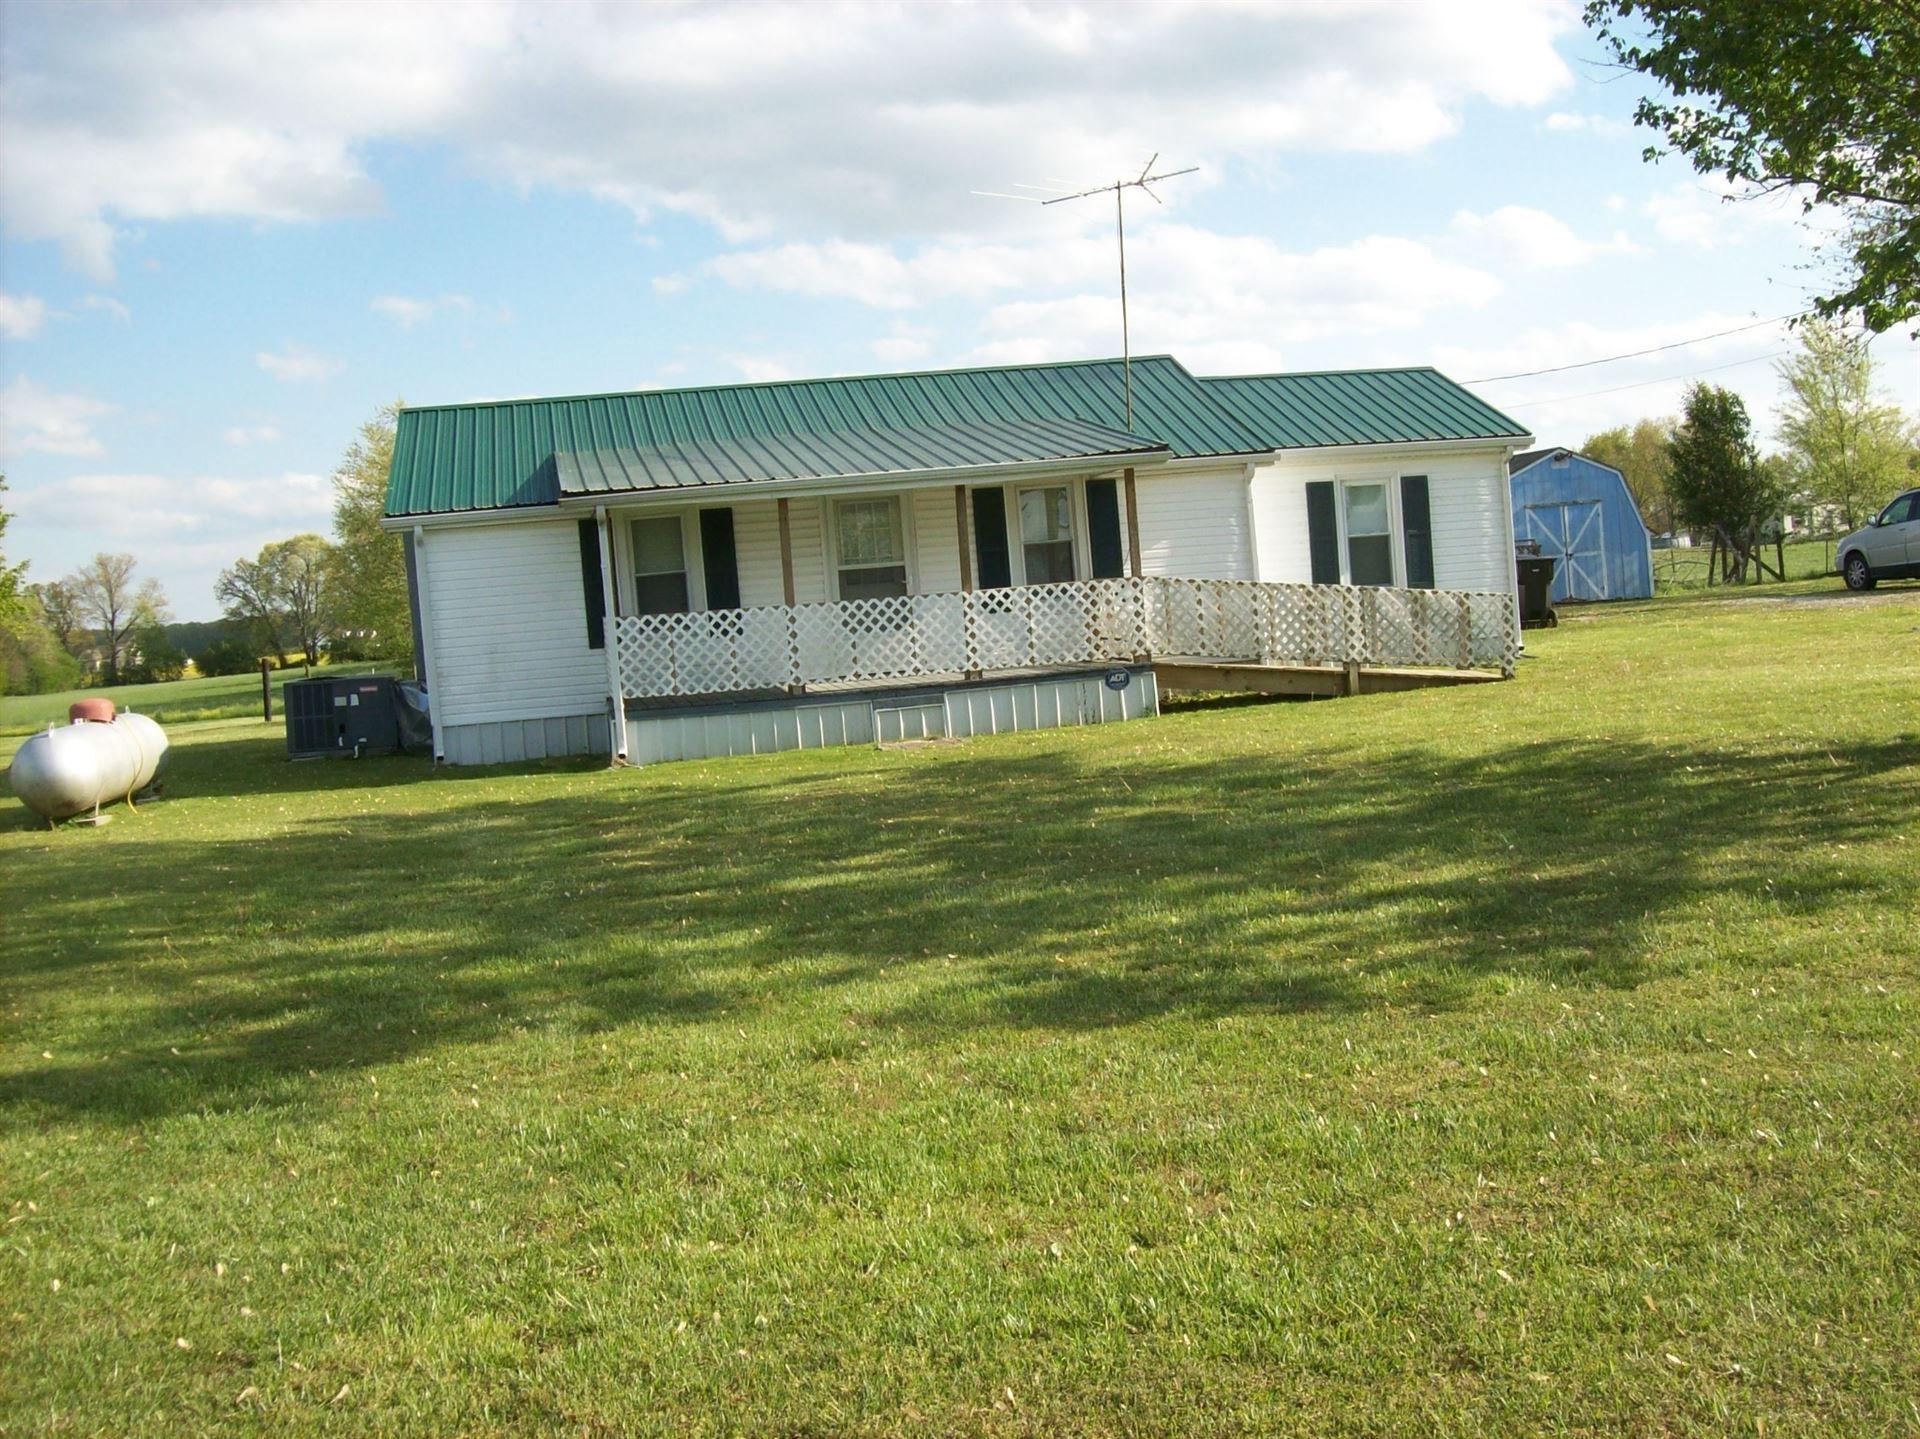 Photo of 220 Pocahontas Rd, Morrison, TN 37357 (MLS # 2246767)